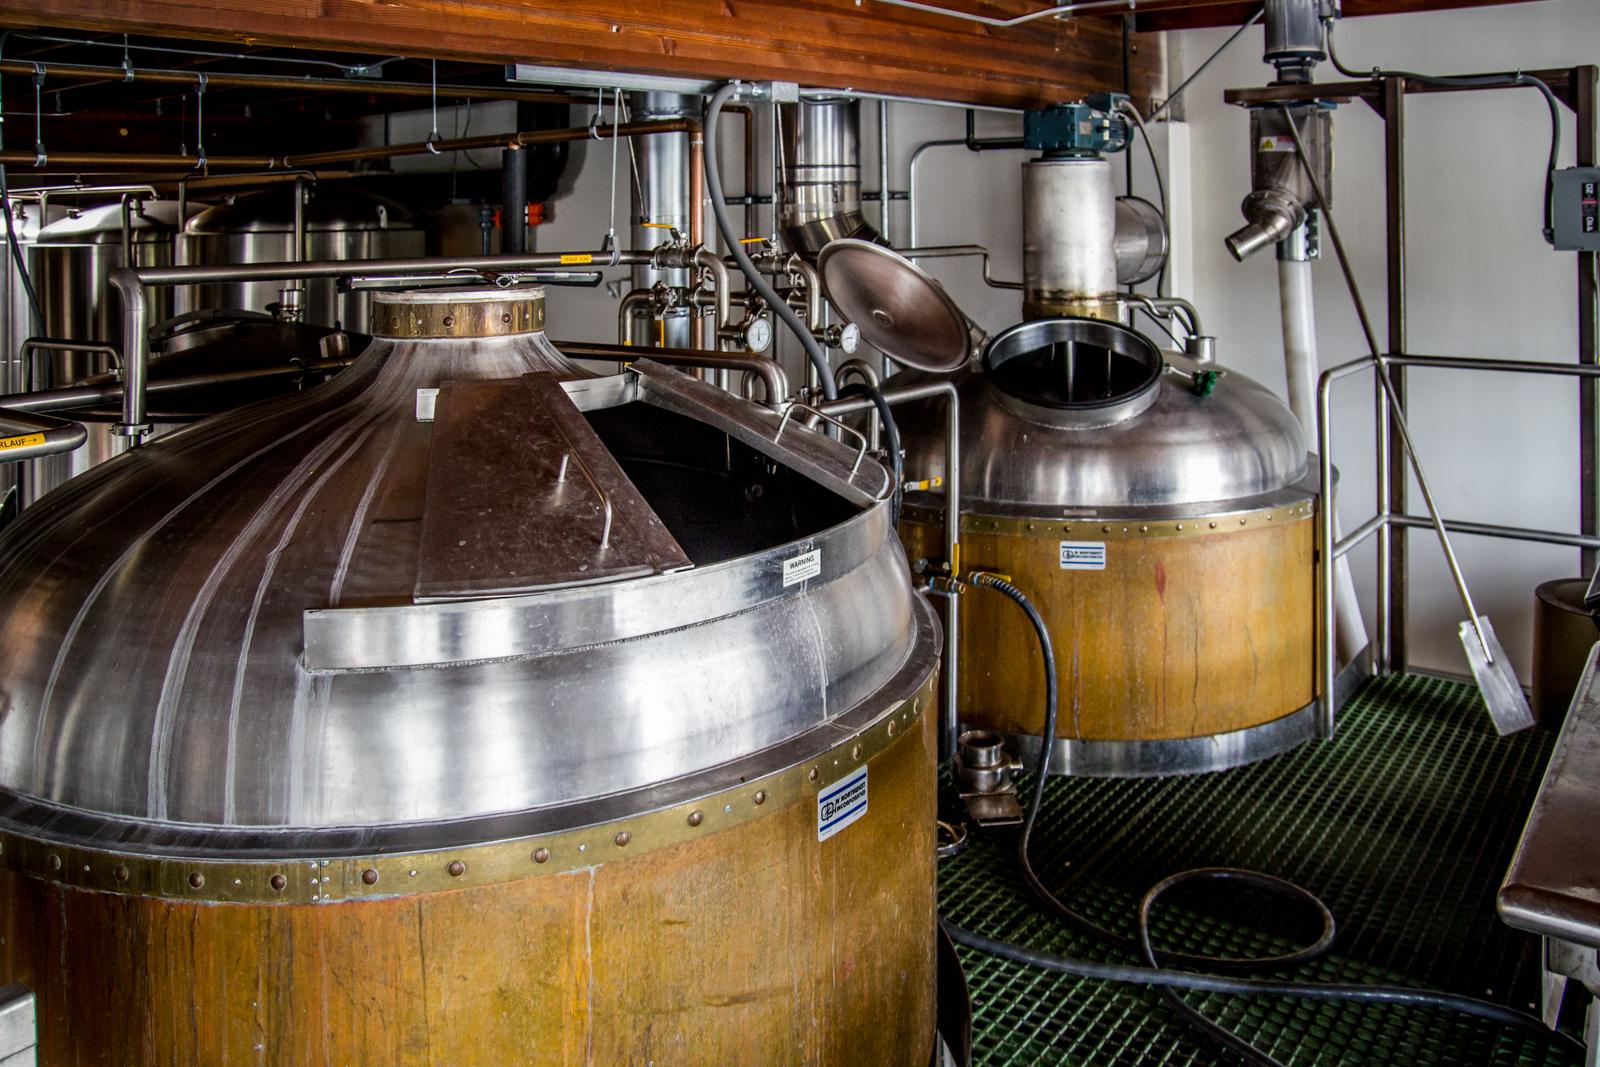 The Brewhouse at Barley Forge